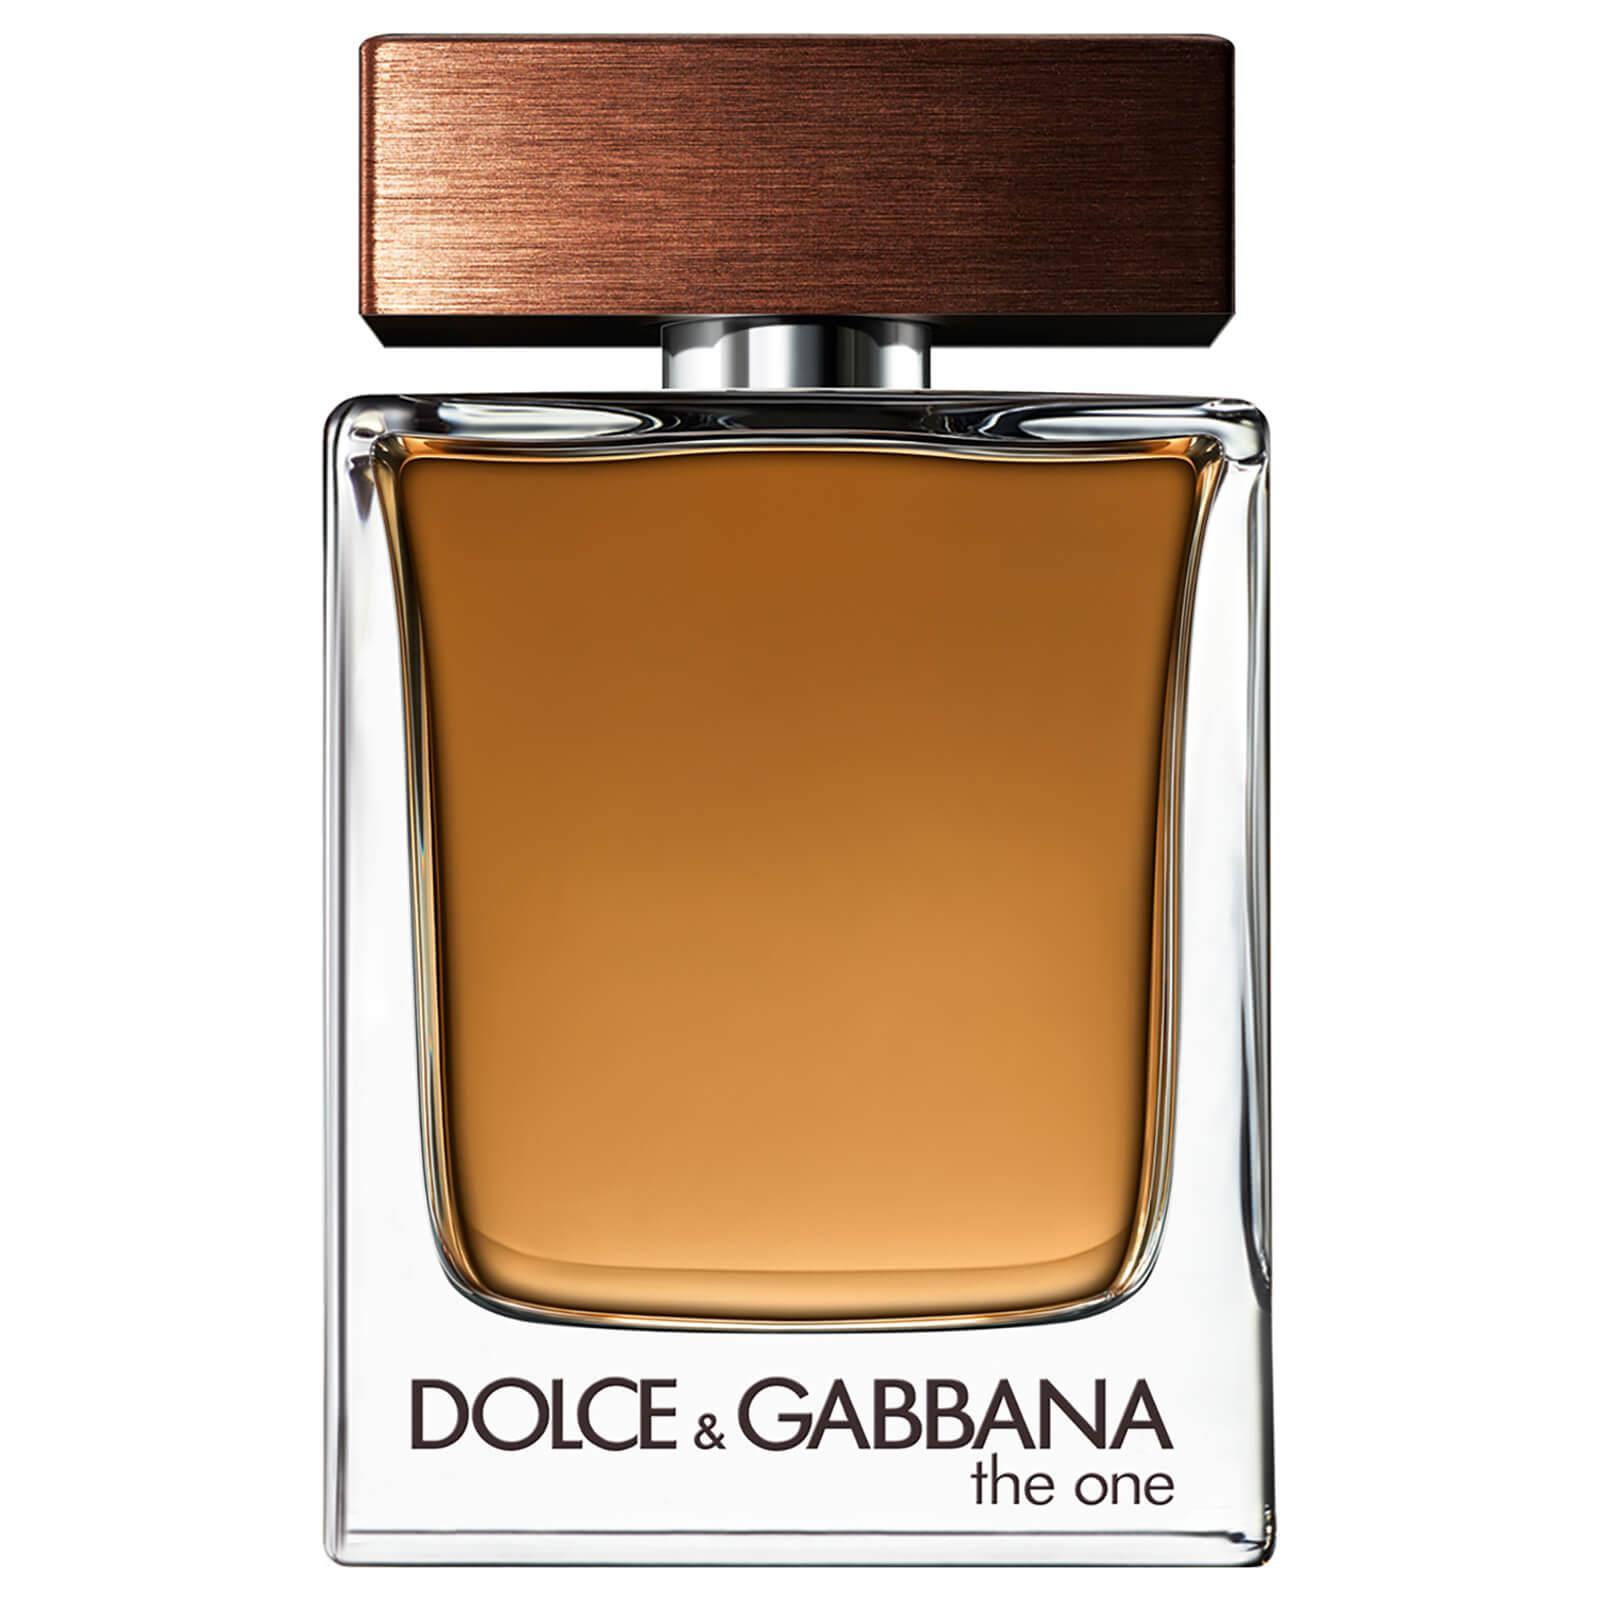 dolce and gabbana perfume eau de toilette